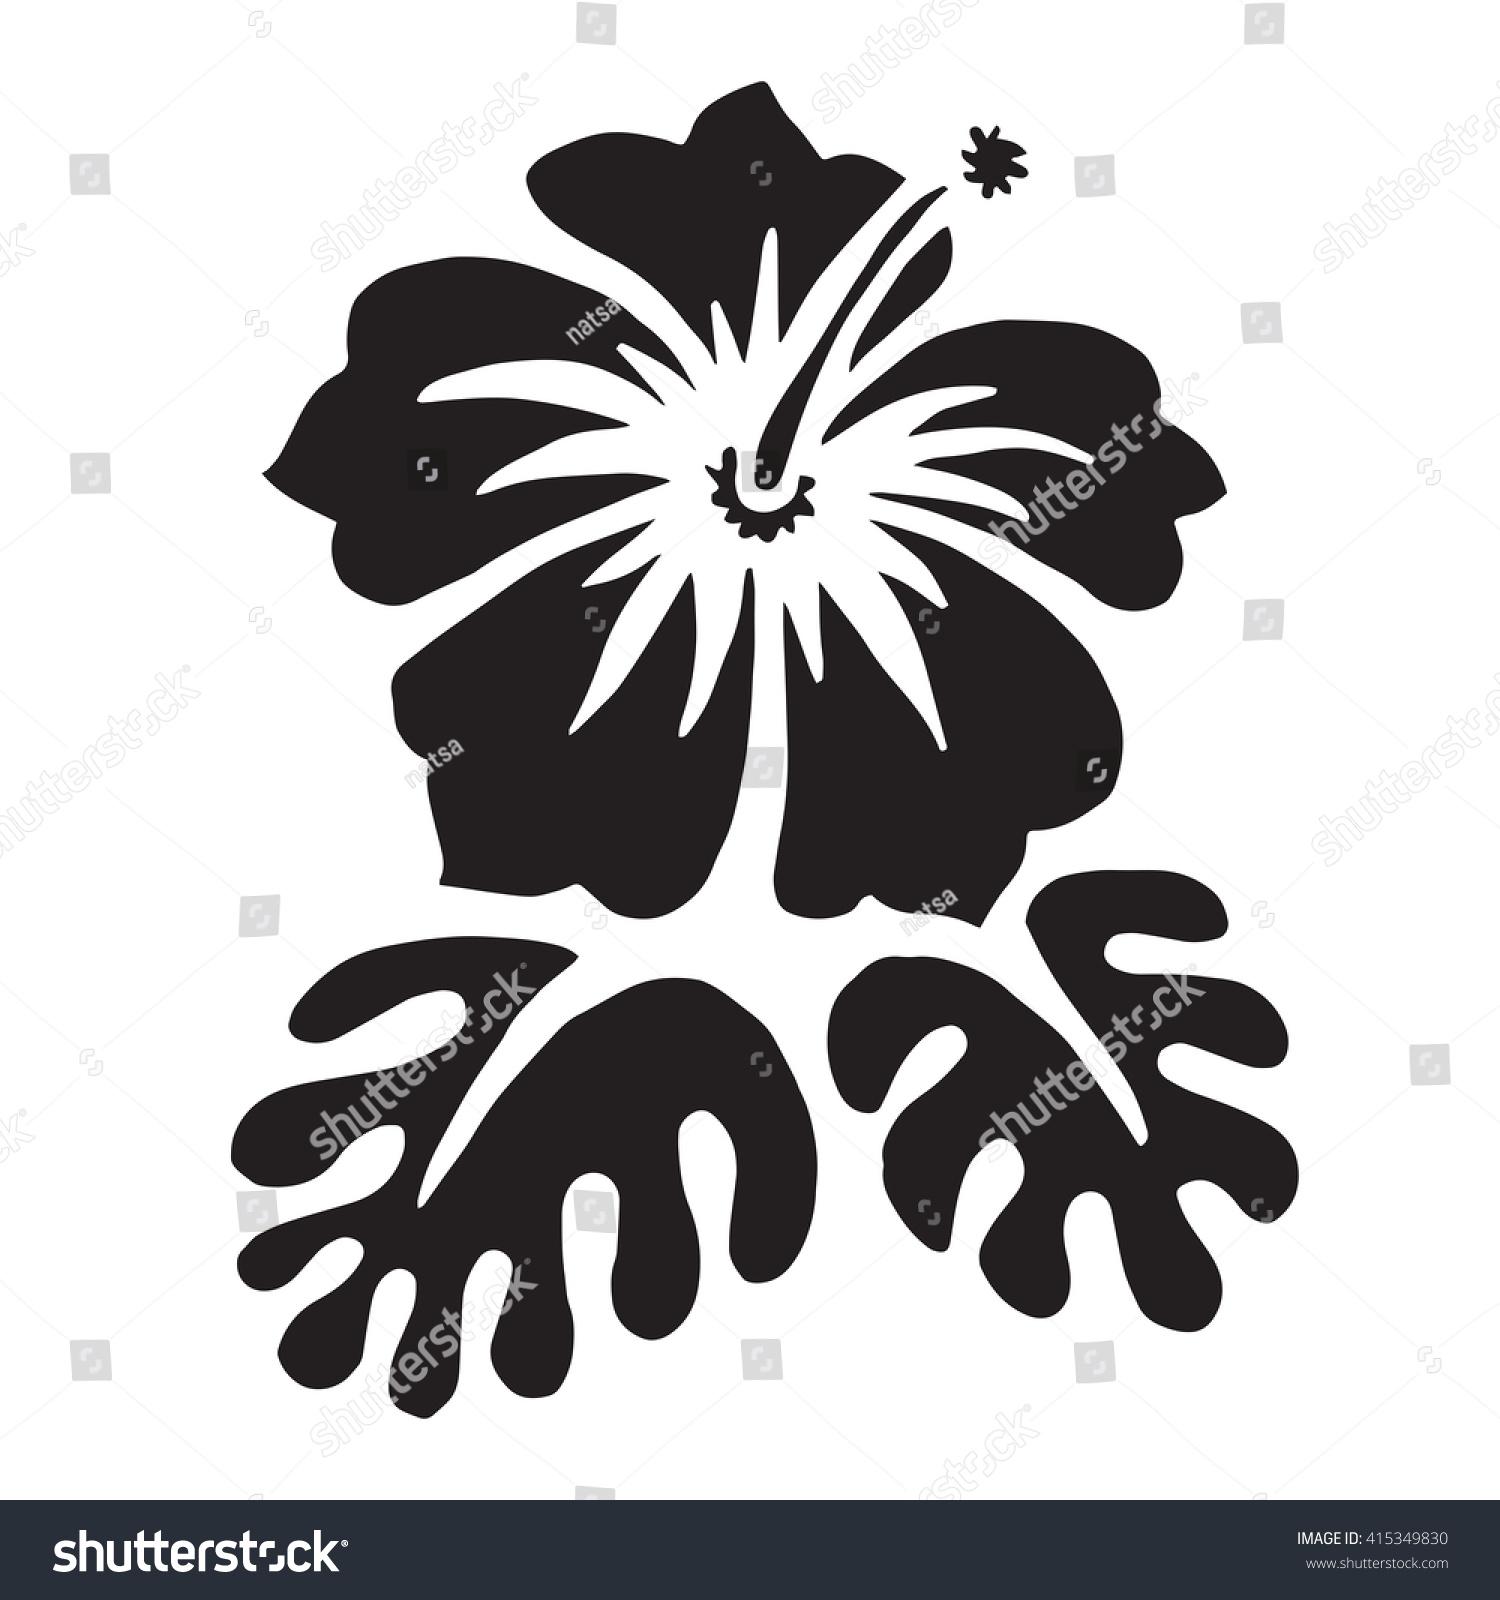 Hibiscus flower surfing tropical symbol black stock illustration hibiscus flower surfing and tropical symbol black silhouette isolated on white raster illustration izmirmasajfo